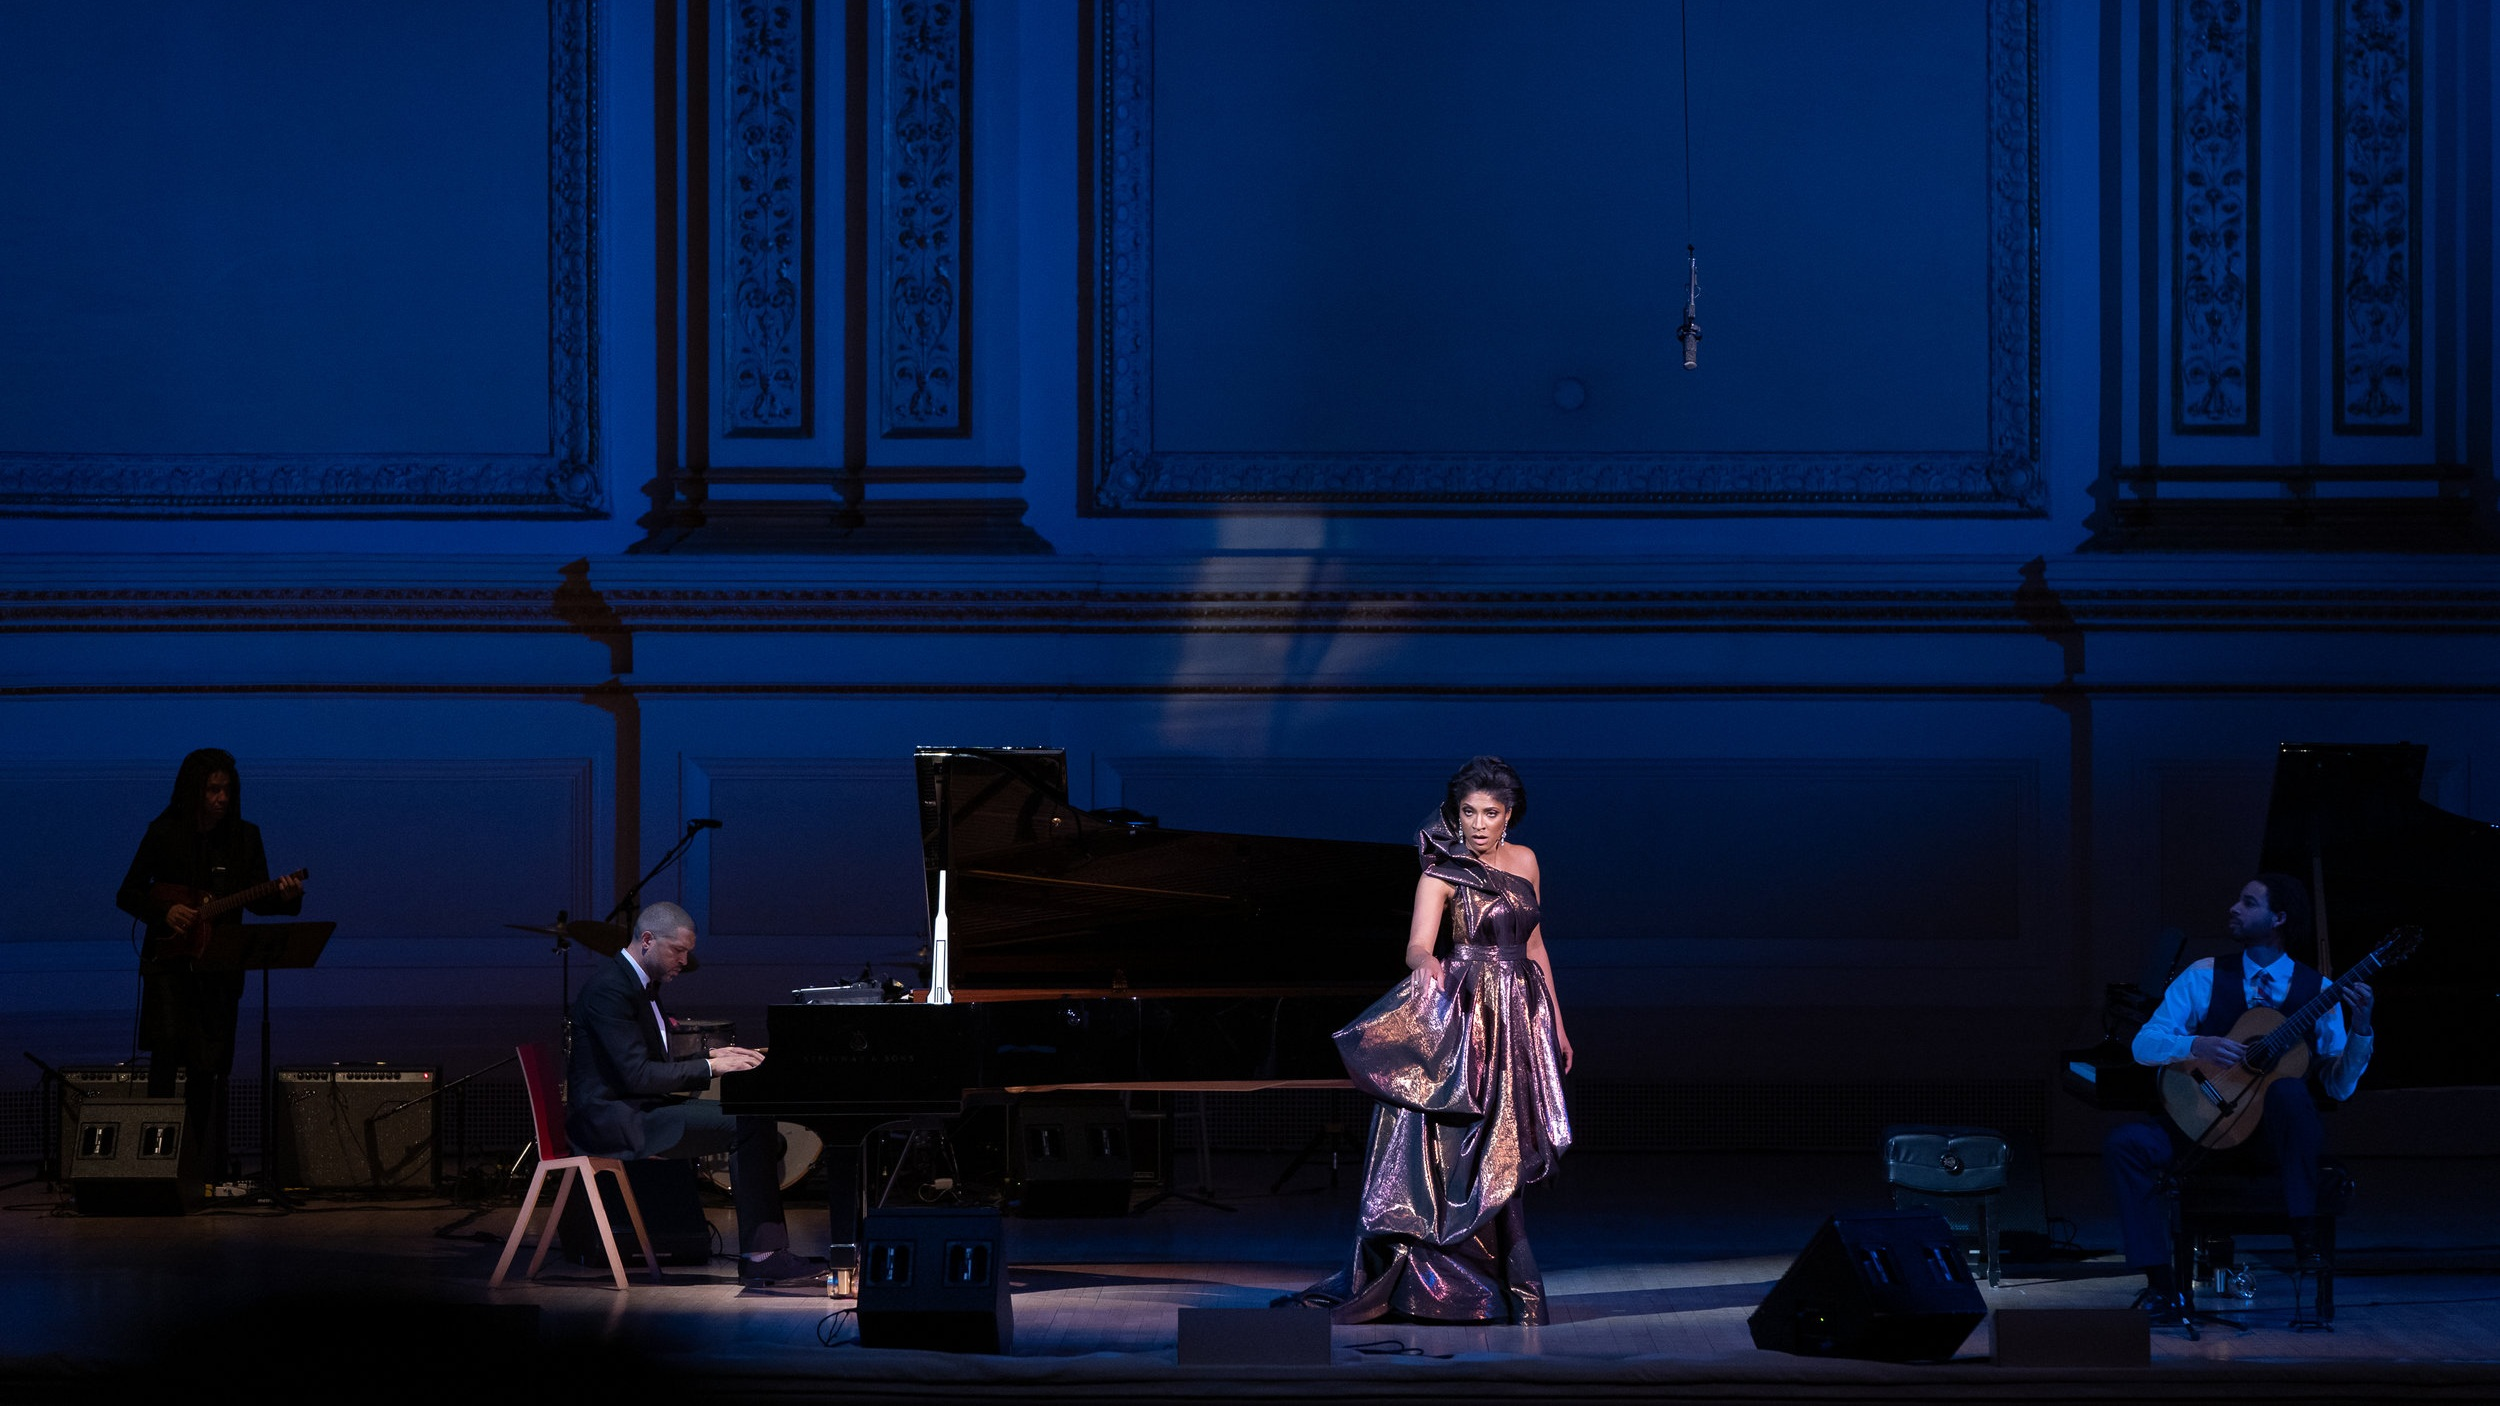 Alicia Hall Moran & Jason Moran at Carnegie Hall, photo by Fadi Kheir